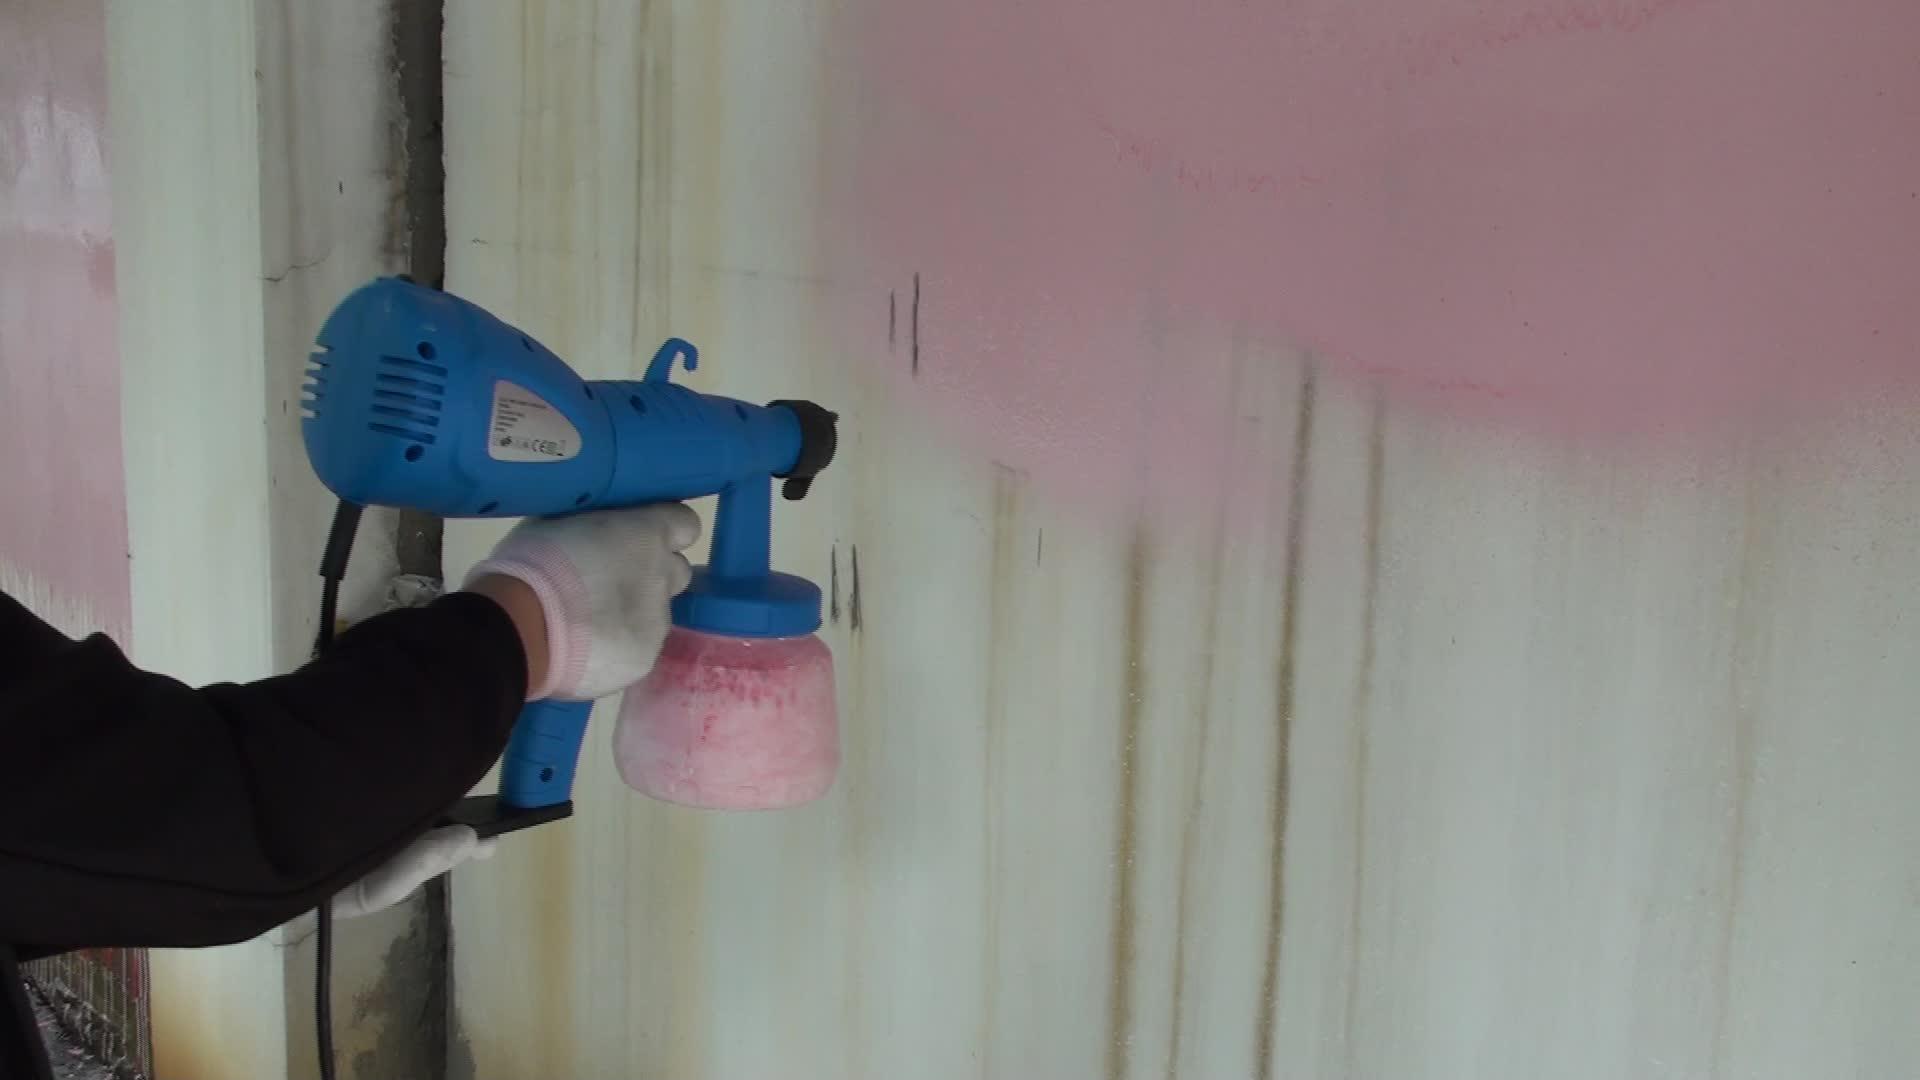 600 W ไฟฟ้า HVLP Airless Paint Sprayer/มือถือ Sprayer เครื่อง